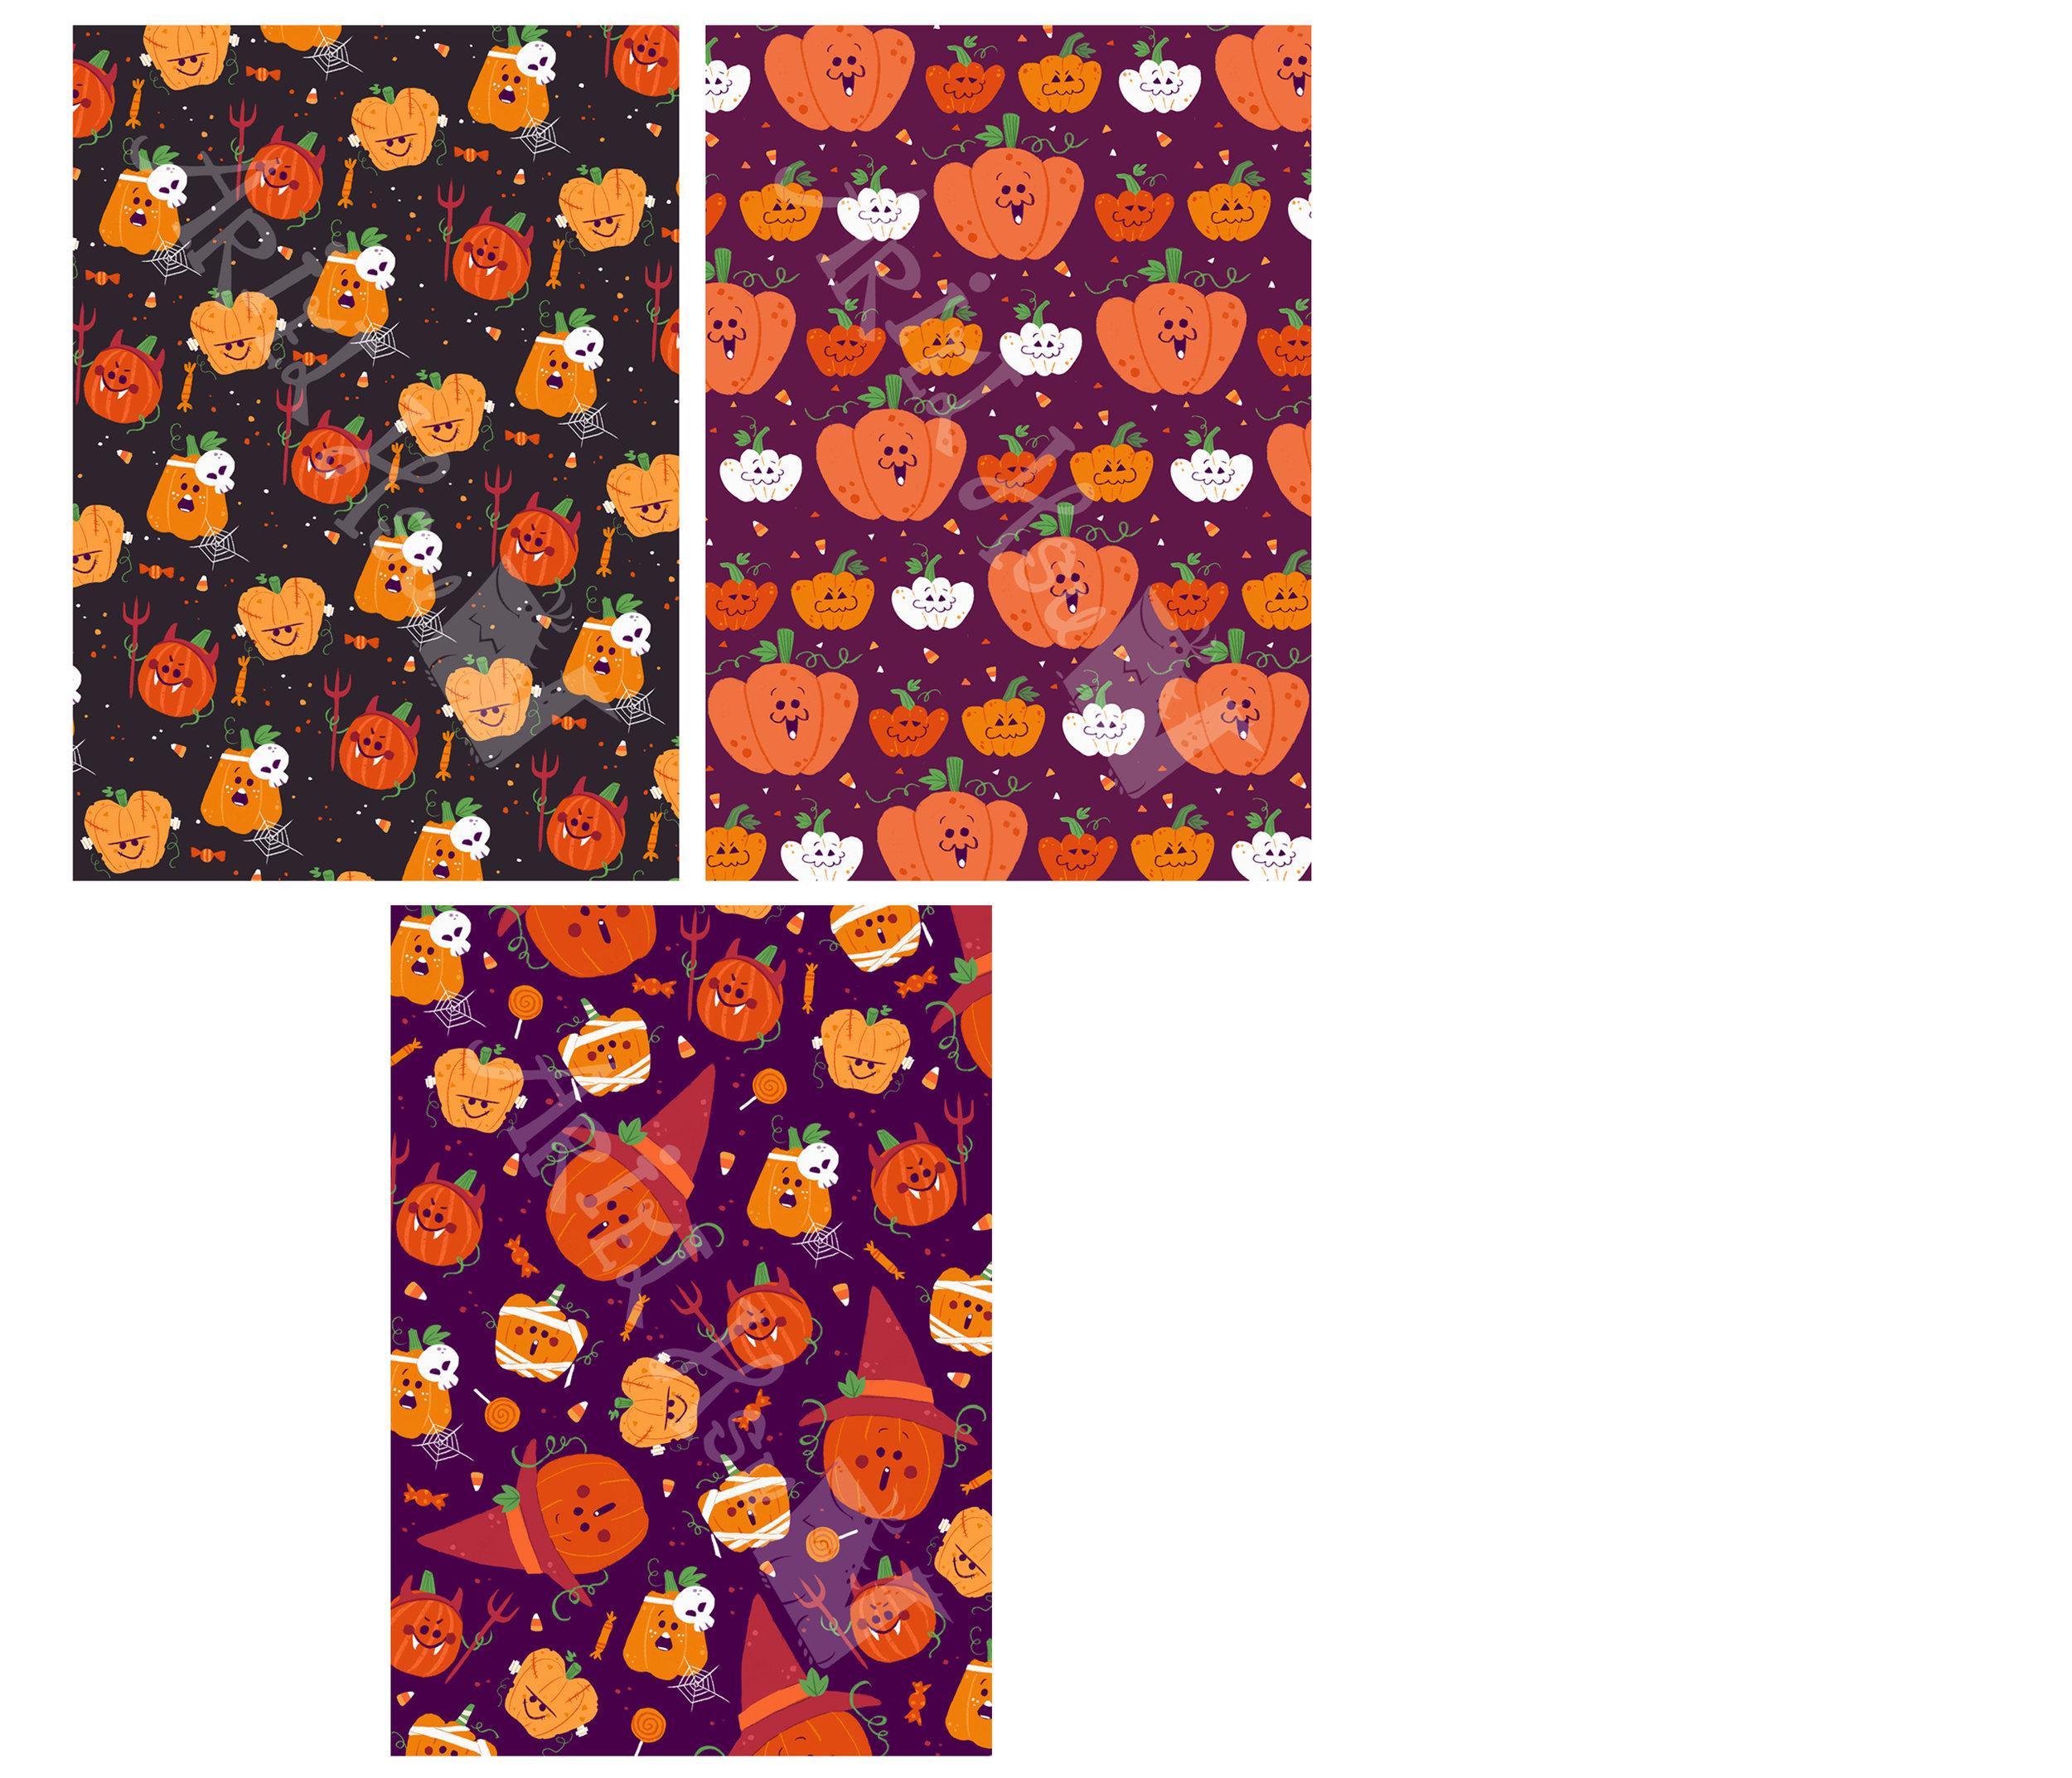 02_Pumpkin Party ill_01.jpg